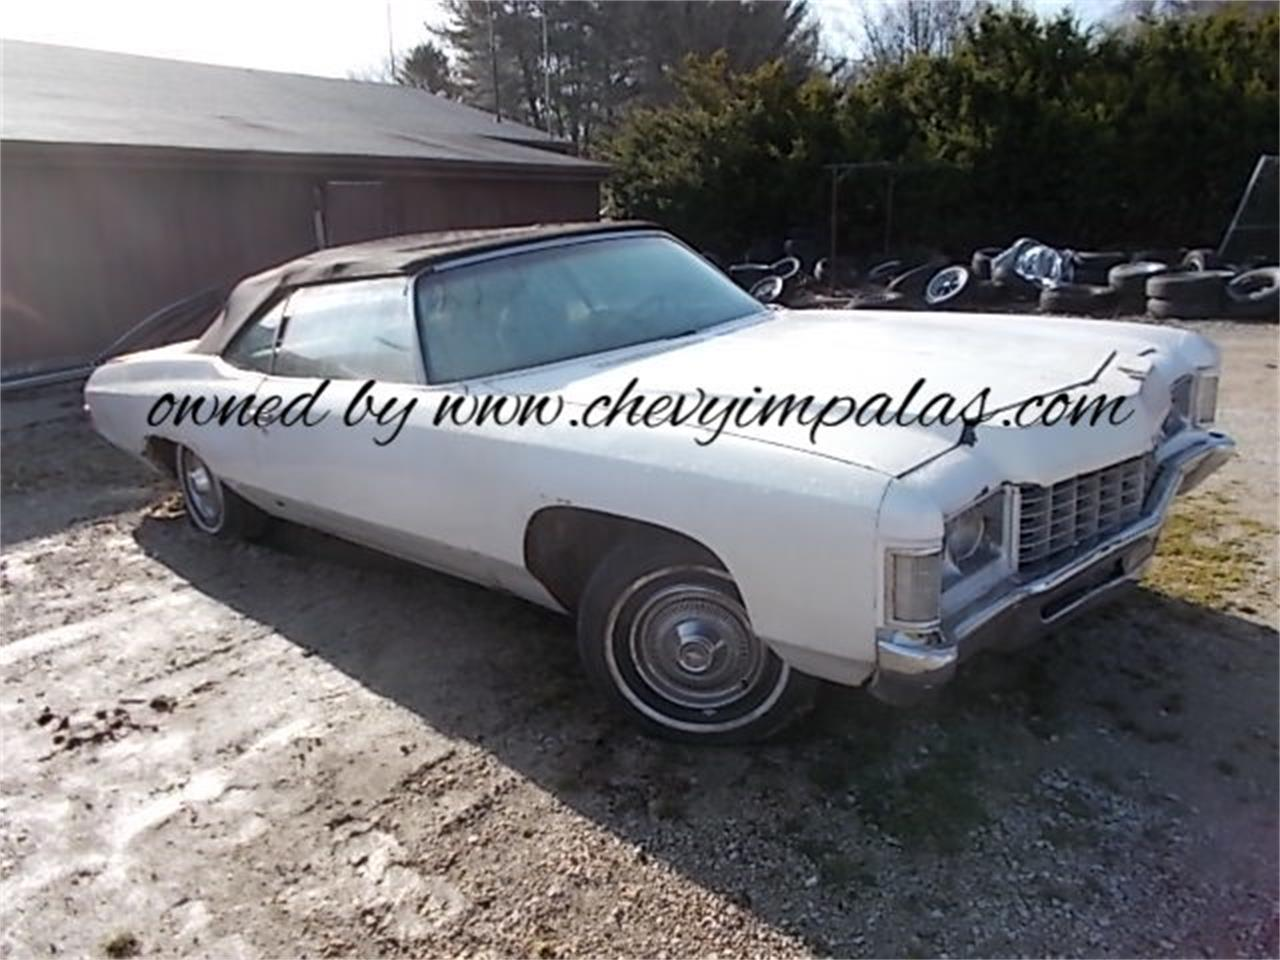 1971 Chevrolet Impala For Sale In Creston Oh Classiccarsbay Com